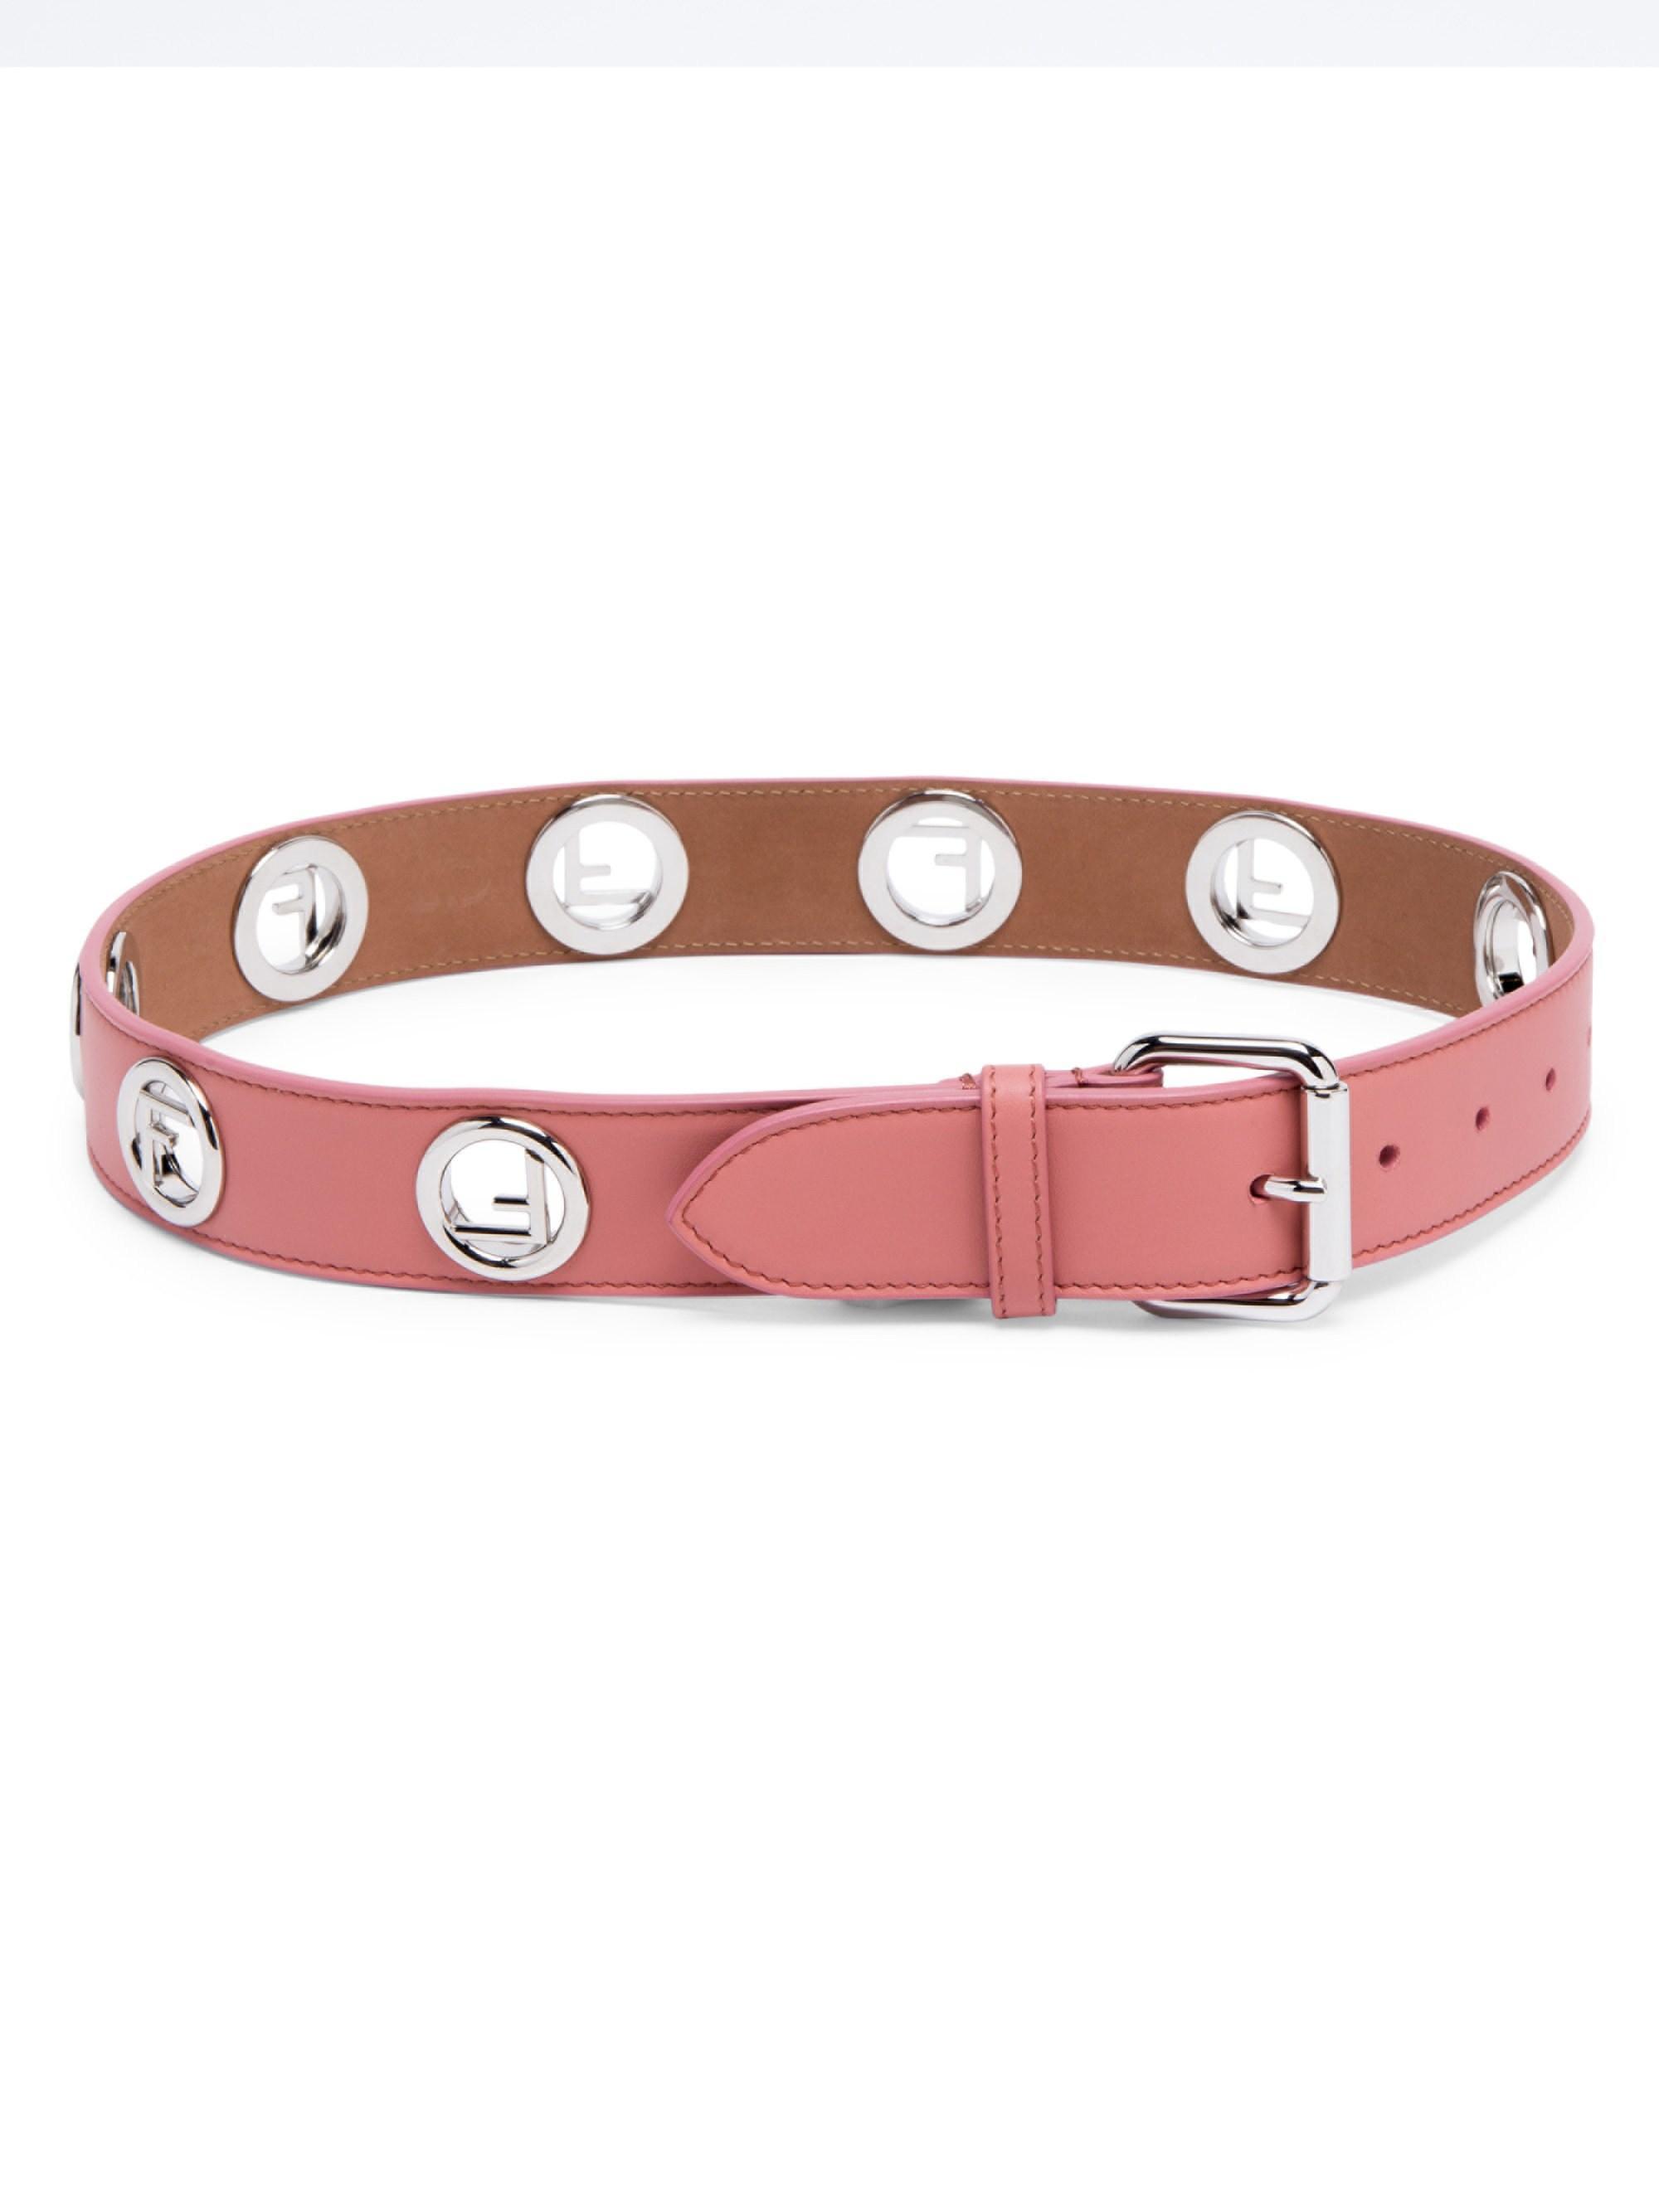 Fendi Women s Silvertone Logo Leather Belt - Pink - Size Large (36 ... afad1e7e068b